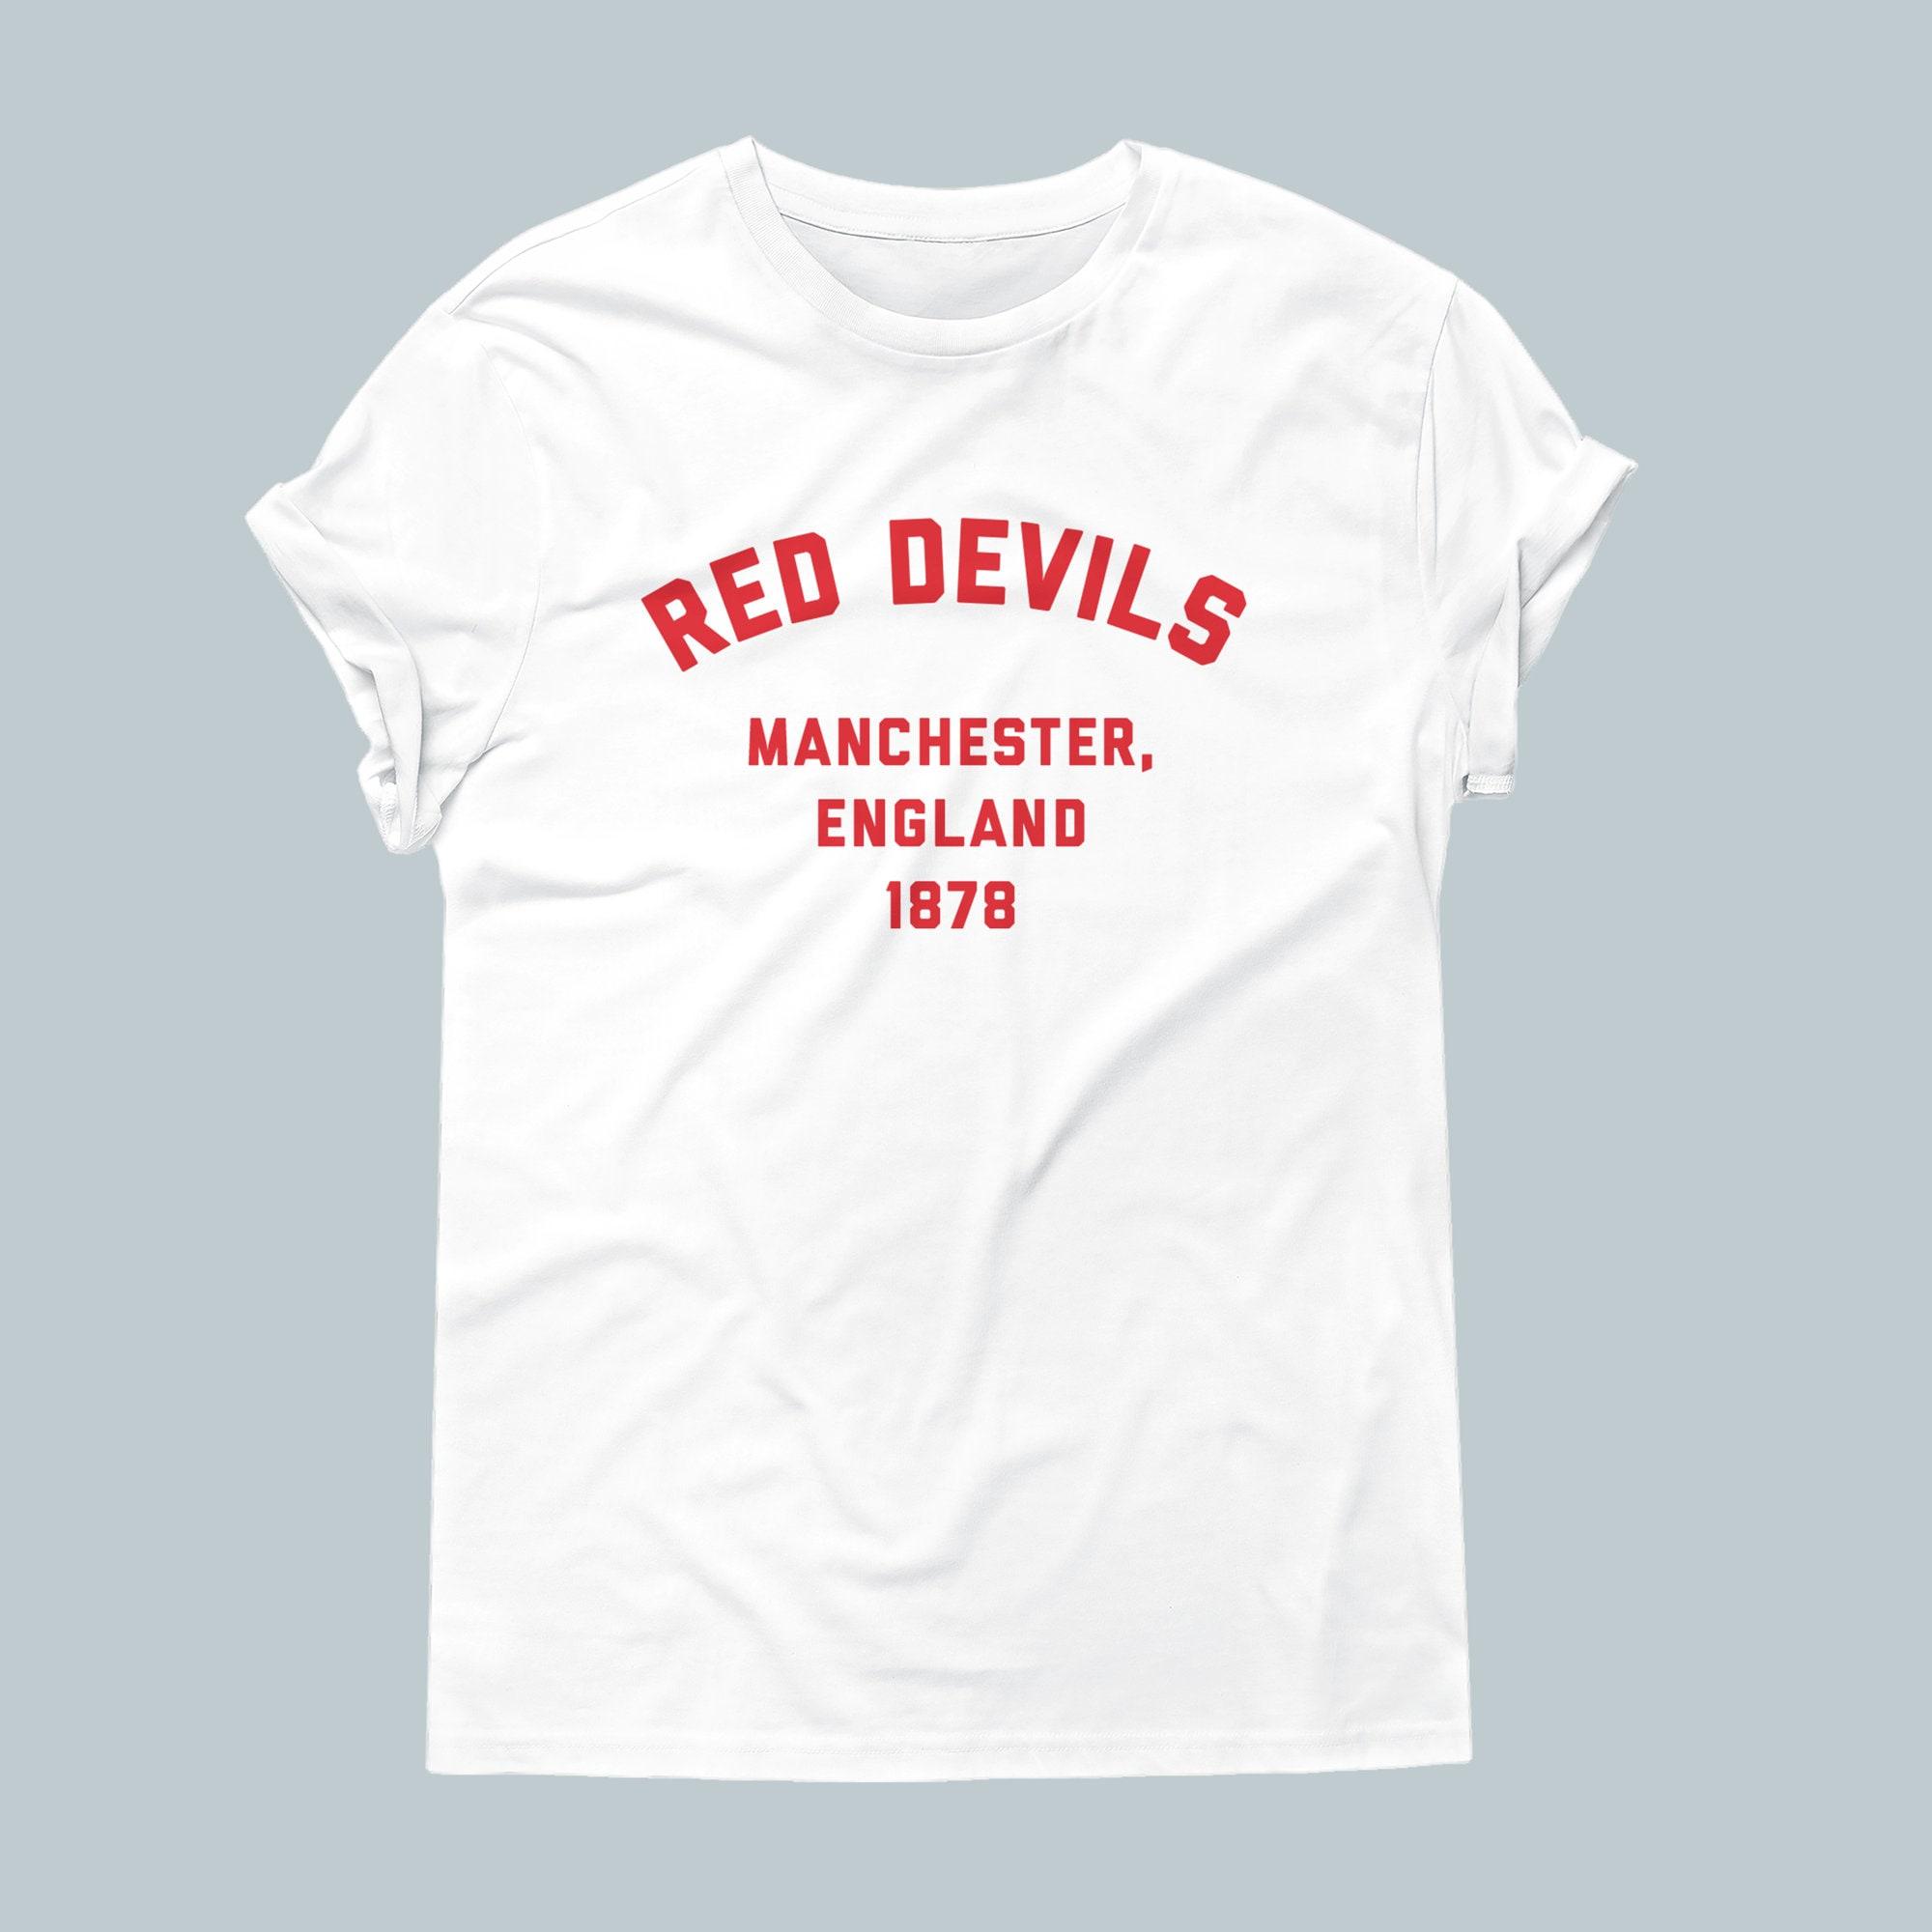 046e61913c7 Manchester United FC Red Devils PE Style Unisex Men s